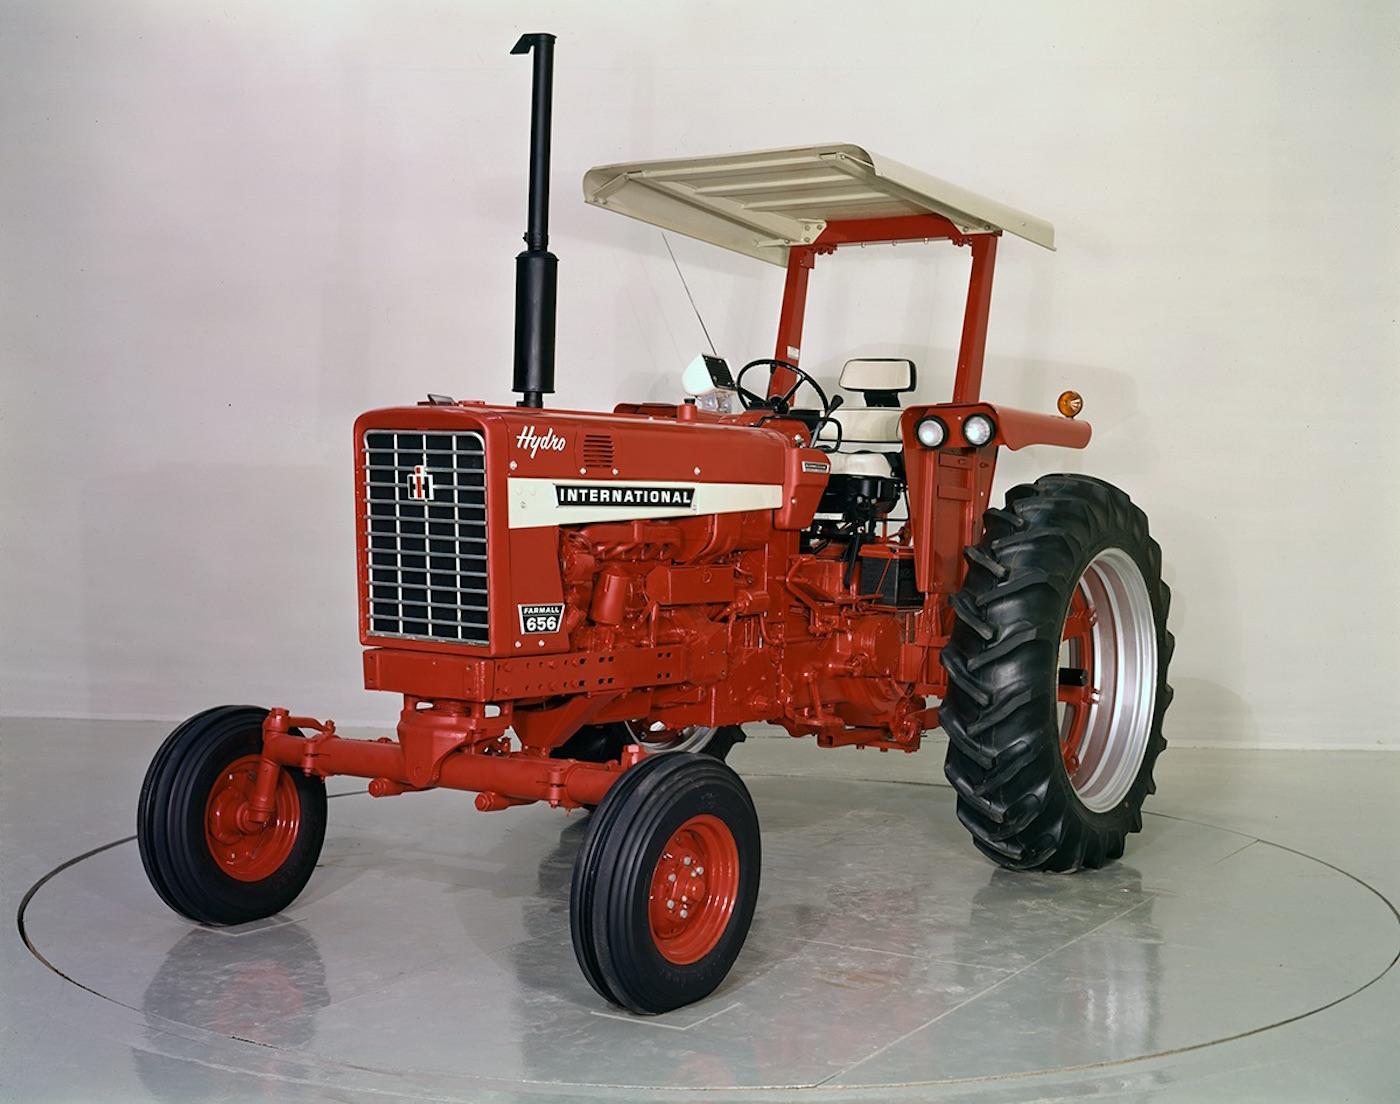 International Tractor Spindle : International octane press